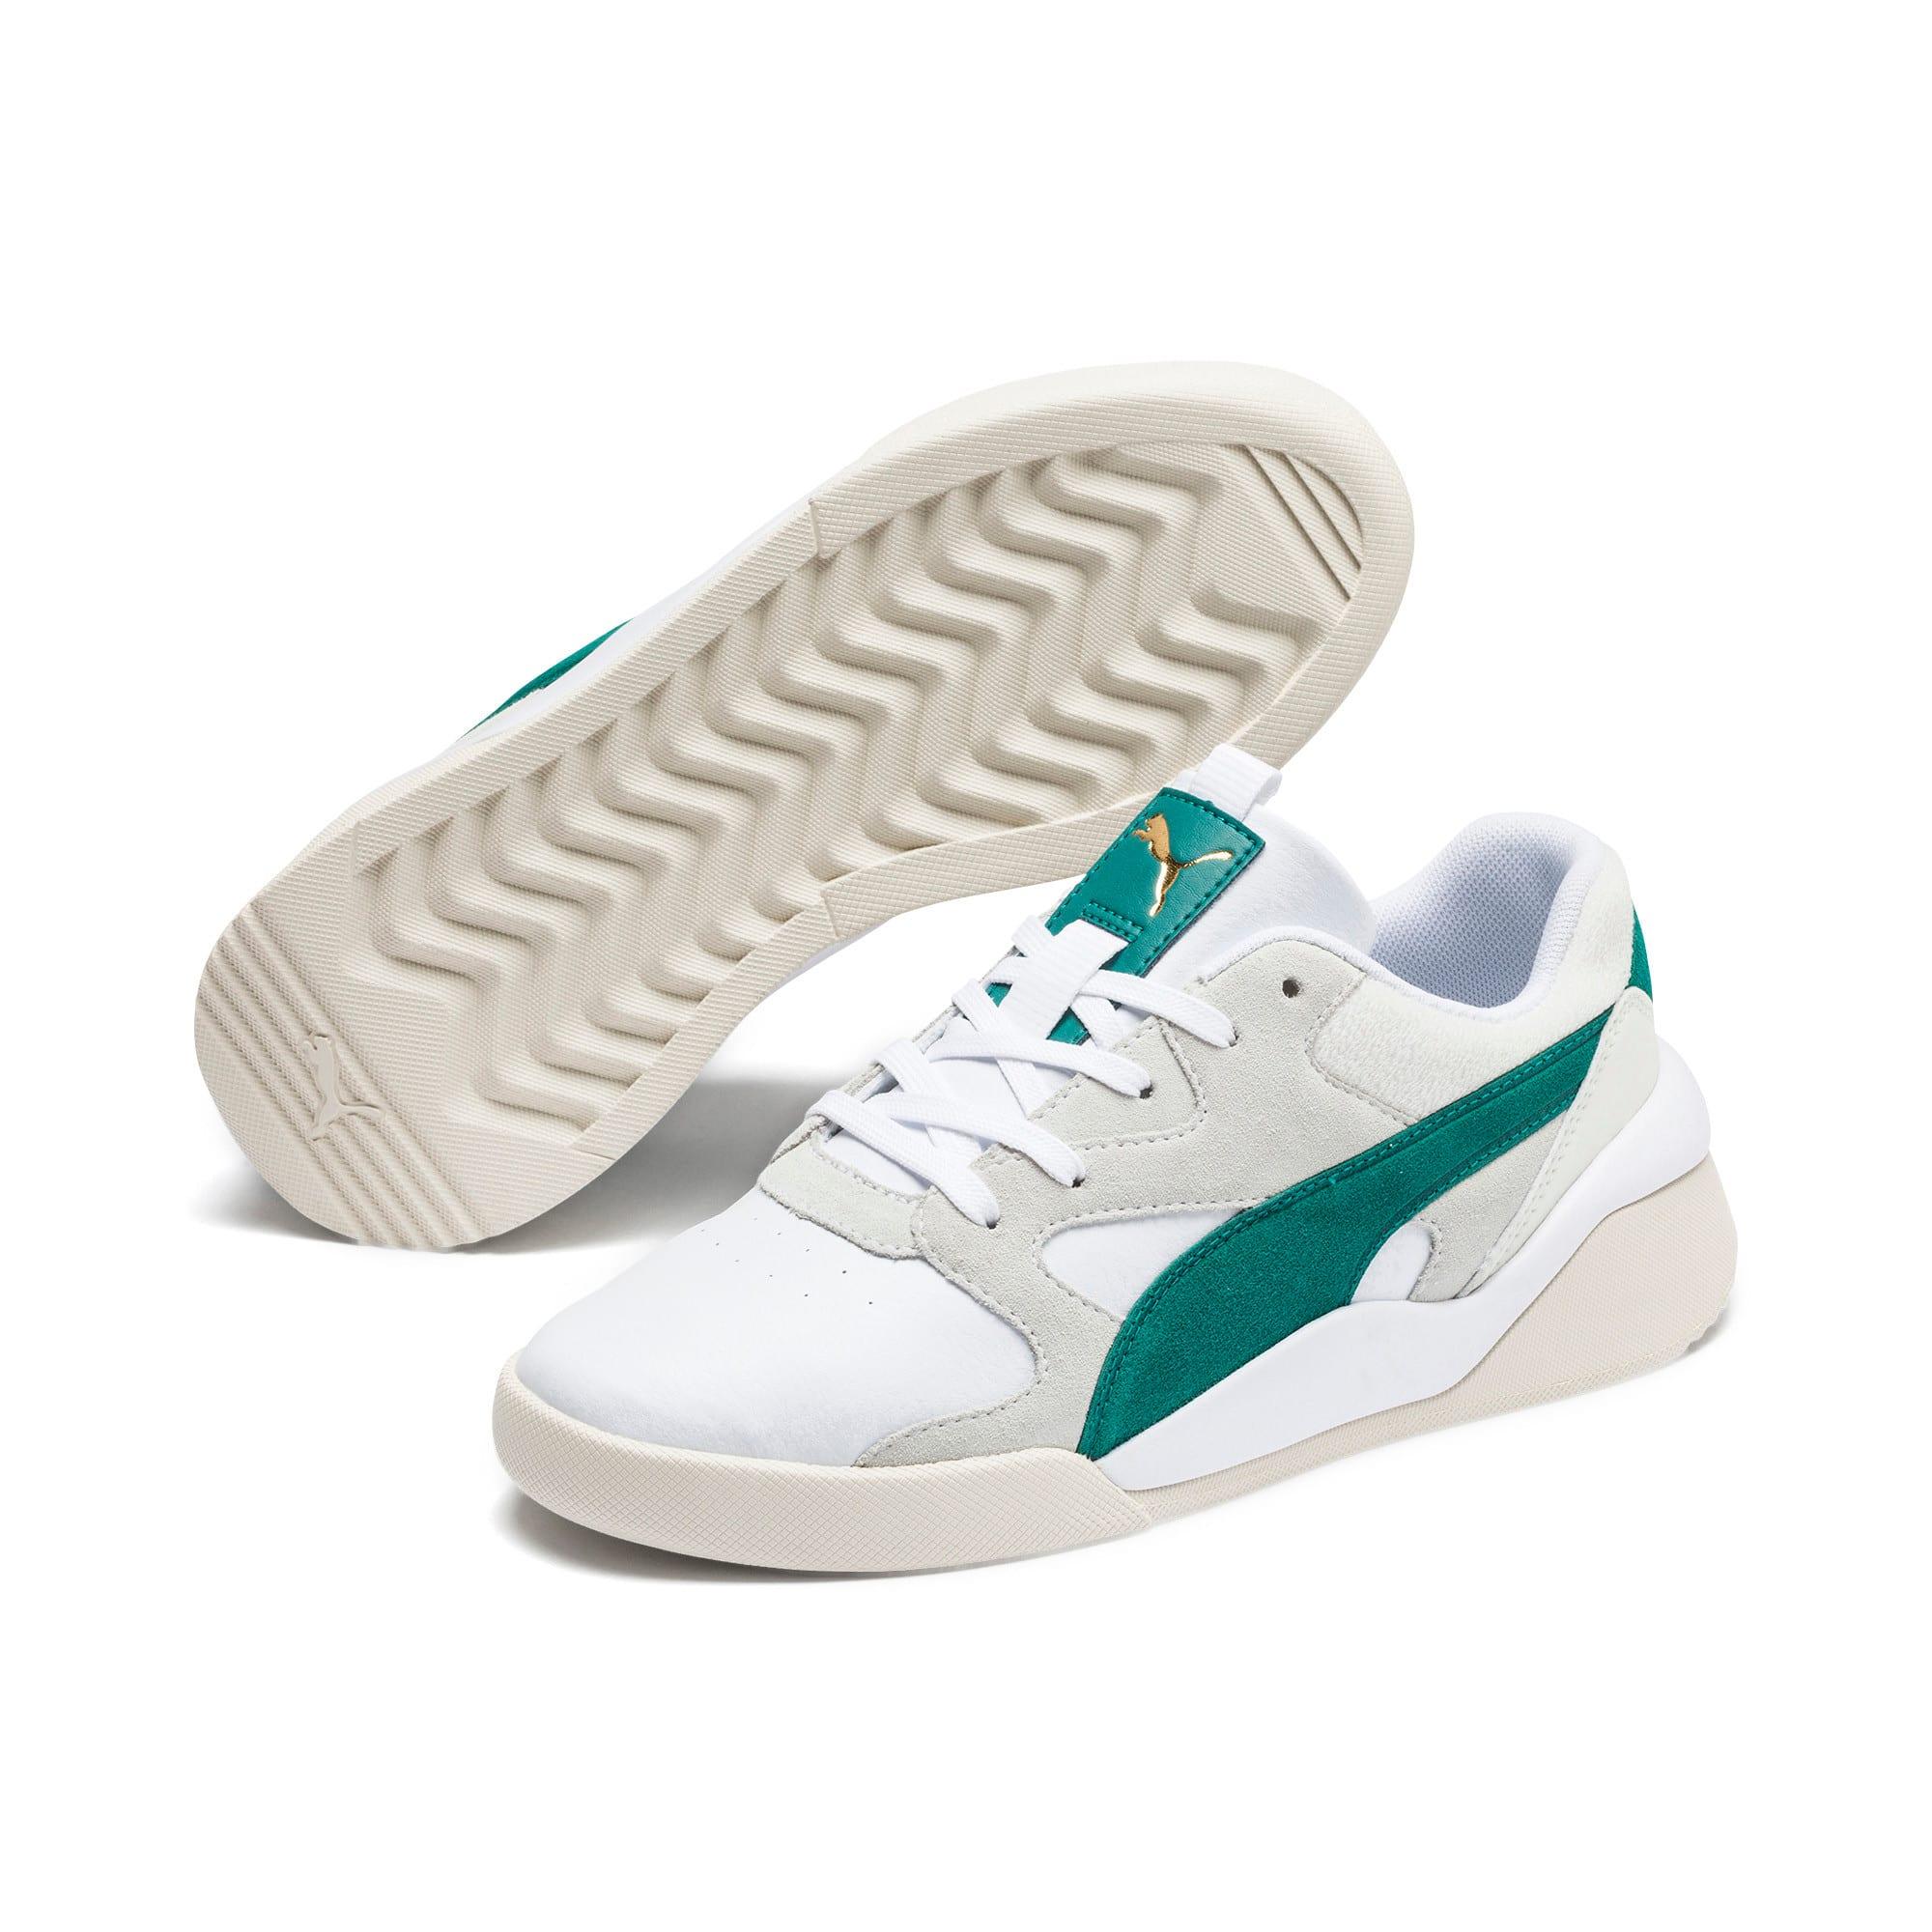 Thumbnail 3 of Aeon Heritage Women's Sneakers, Puma White-Teal Green, medium